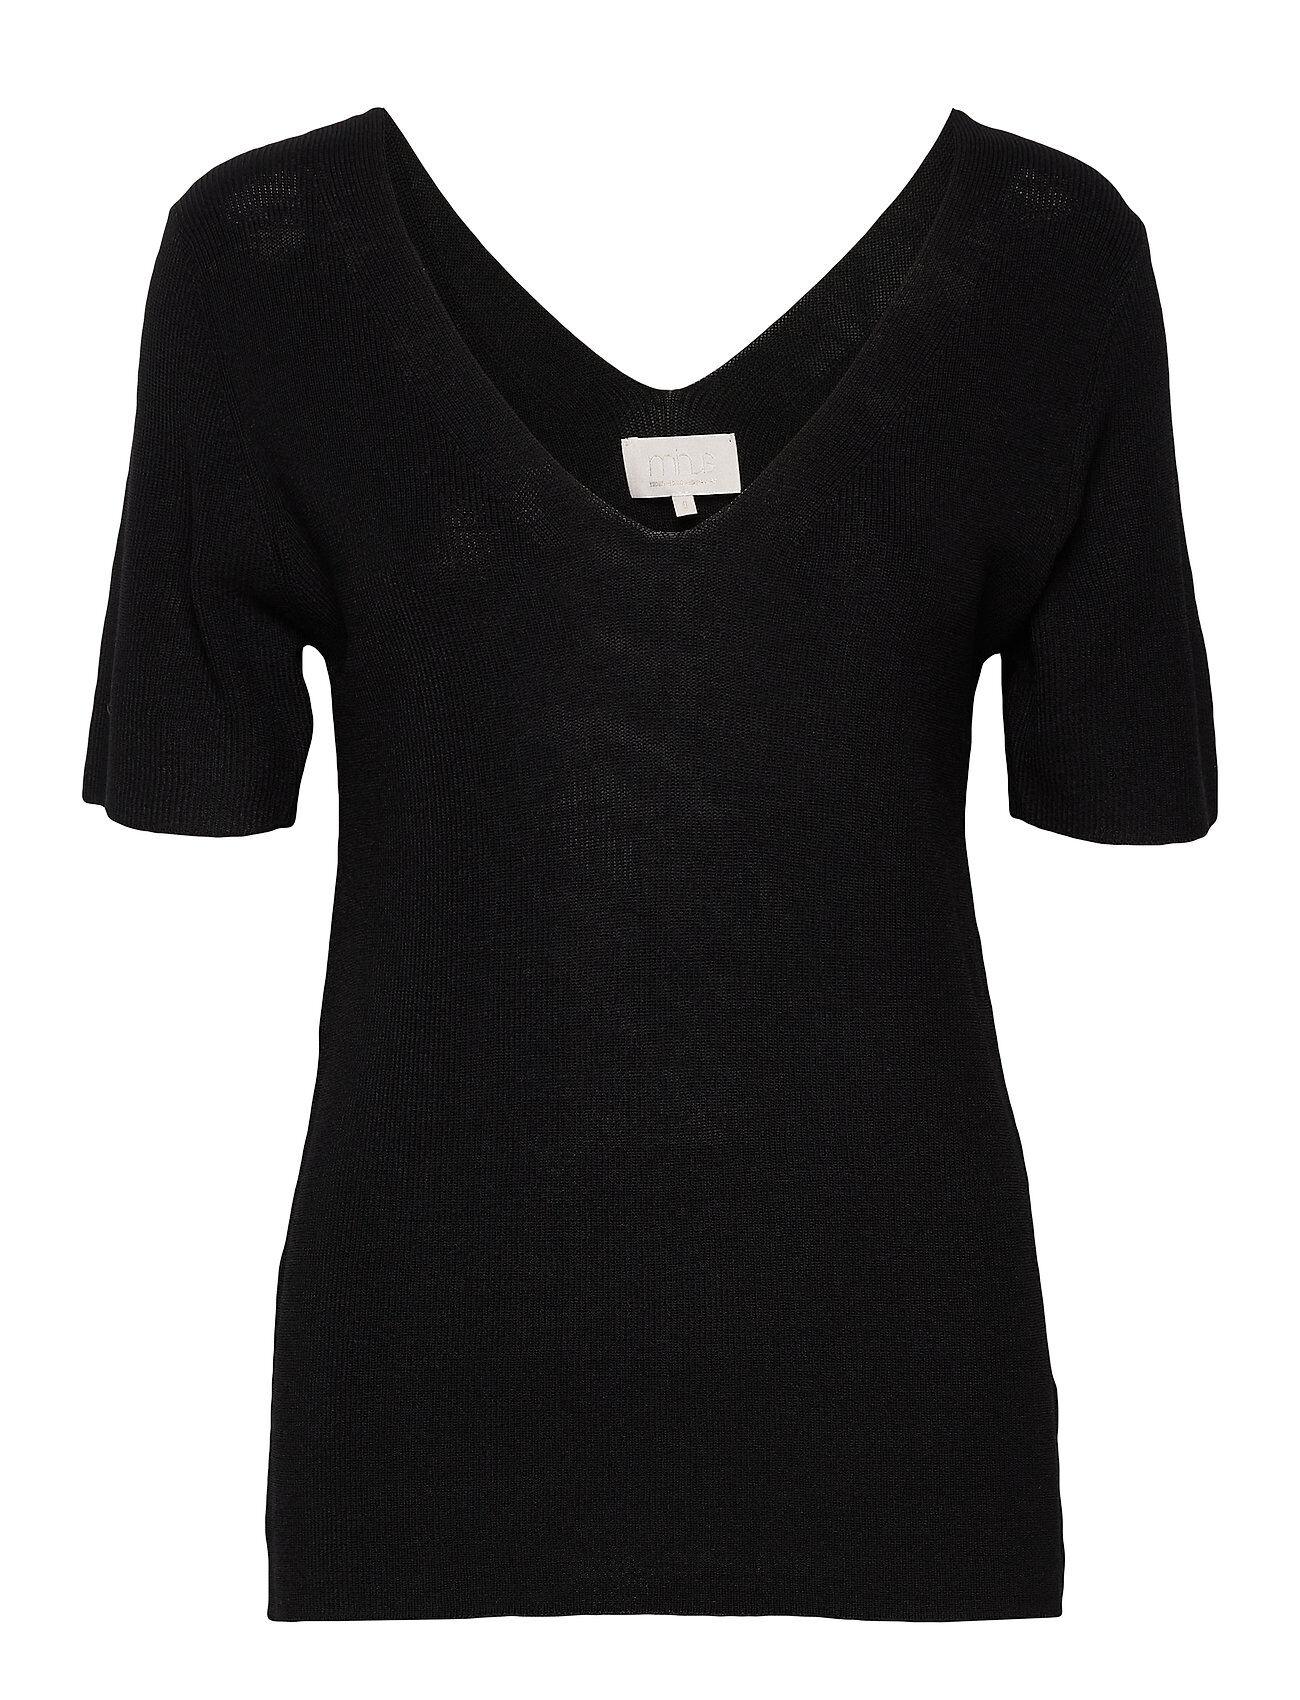 Minus Bex Knit Tee T-shirts & Tops Knitted T-shirts/tops Musta Minus